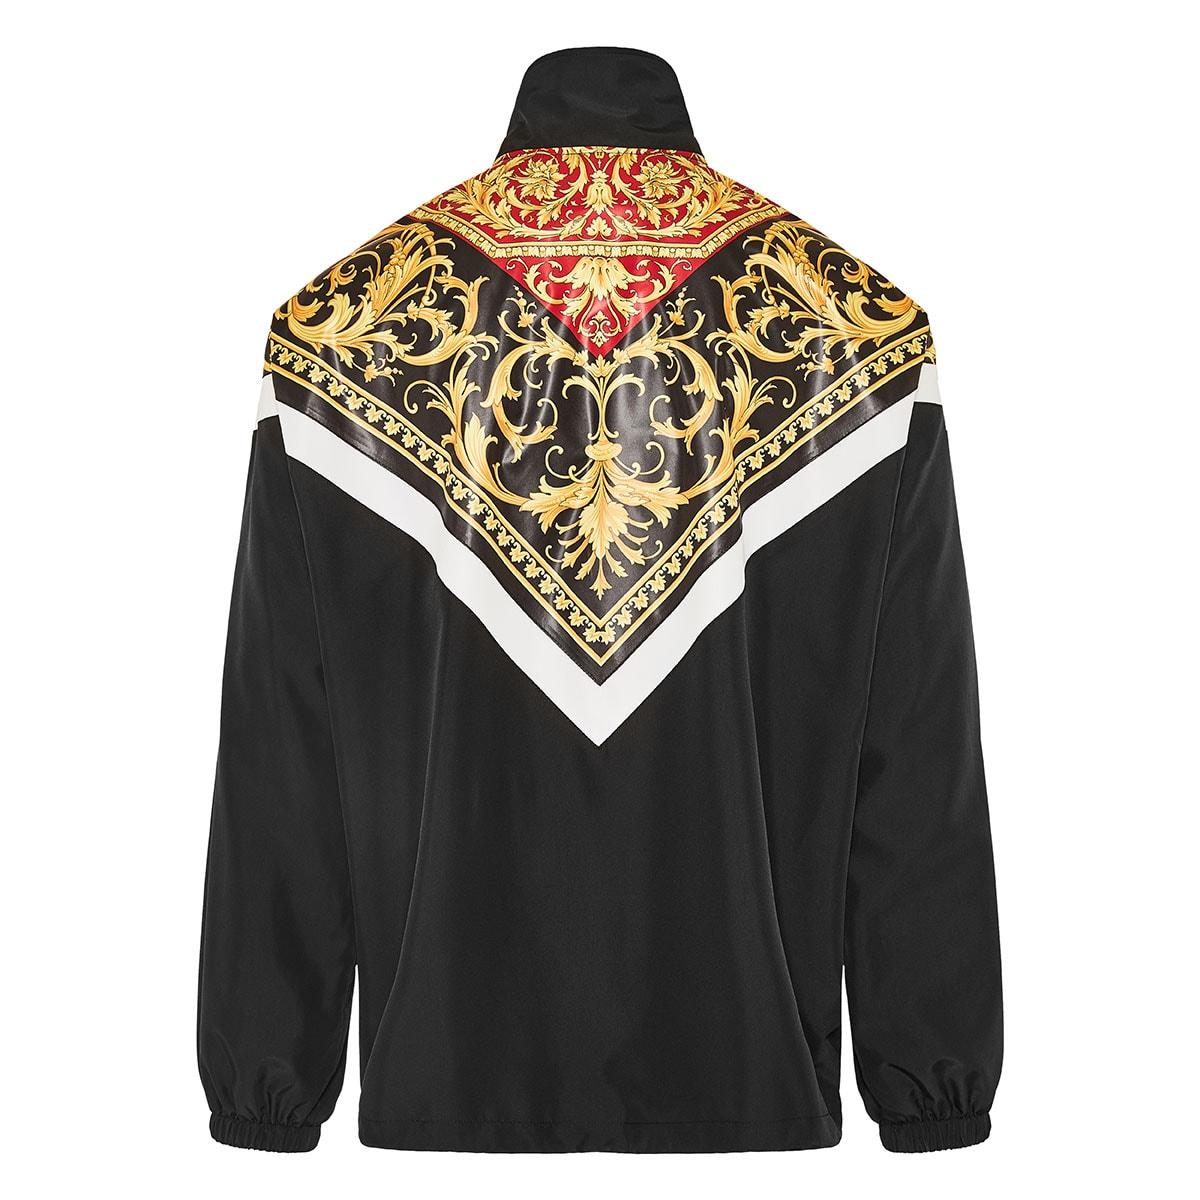 Baroque print oversized nylon jacket